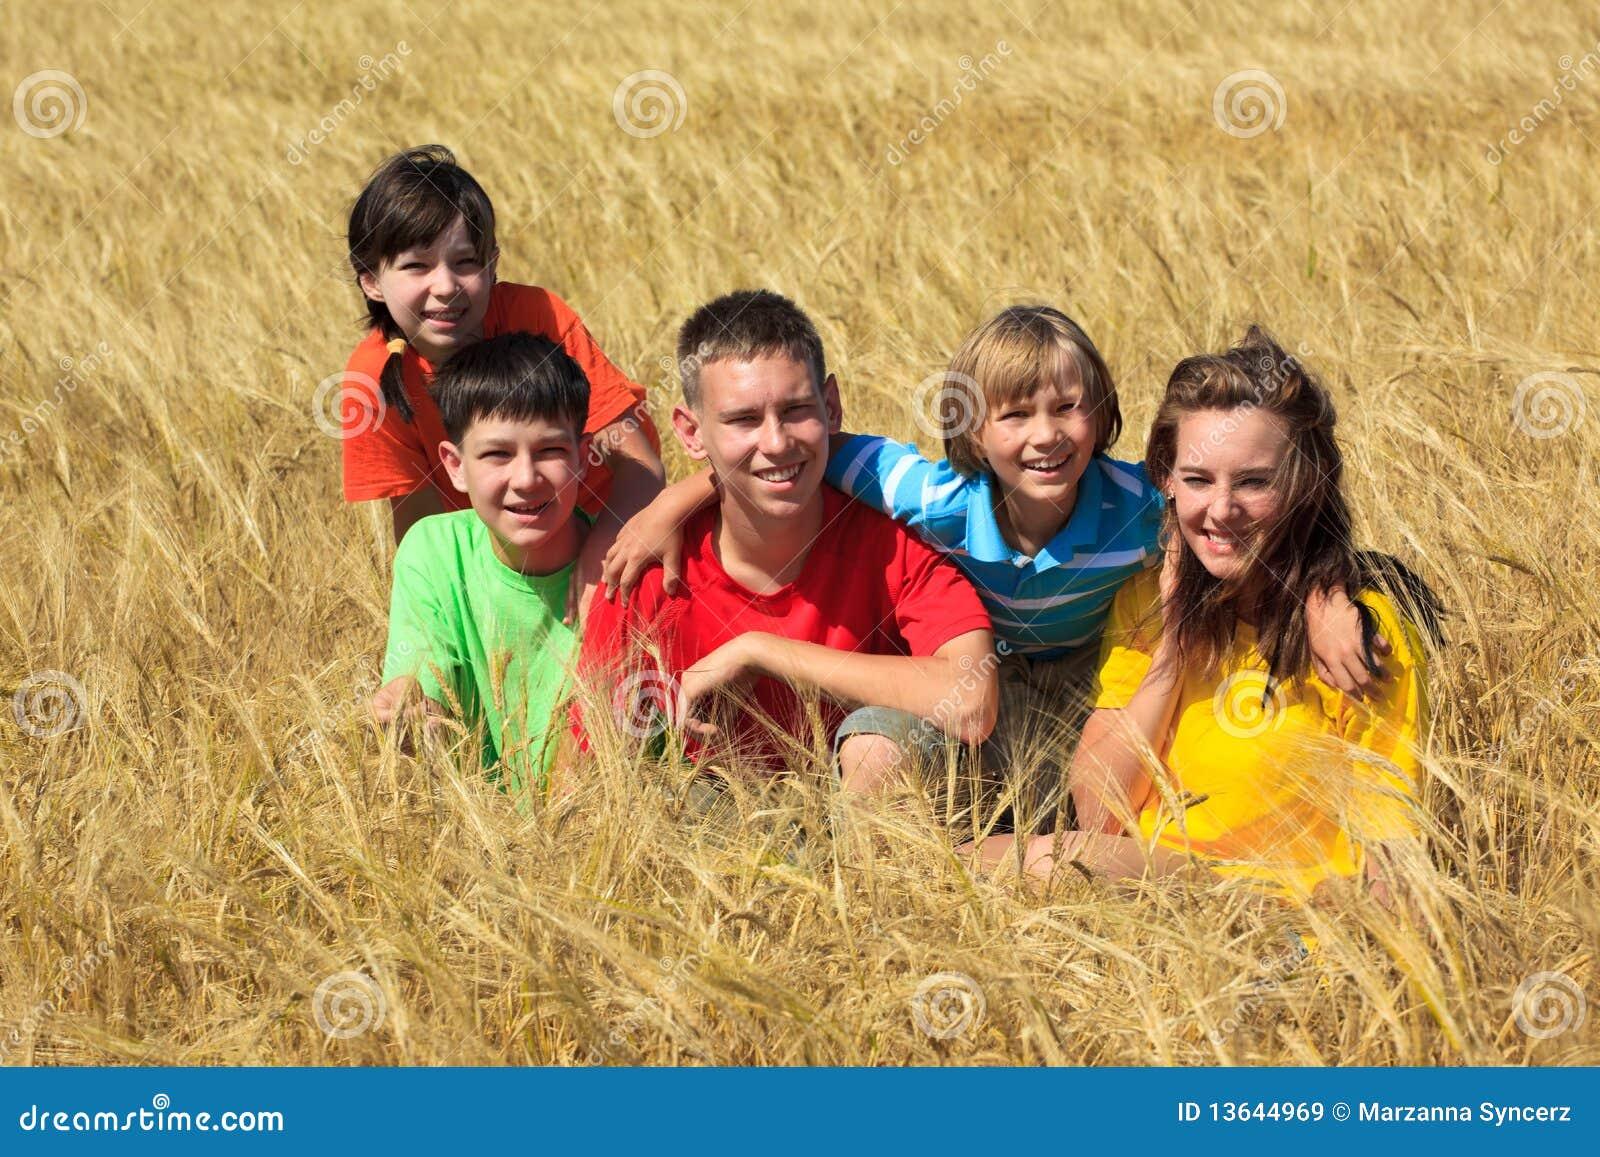 Barn field sittande vete